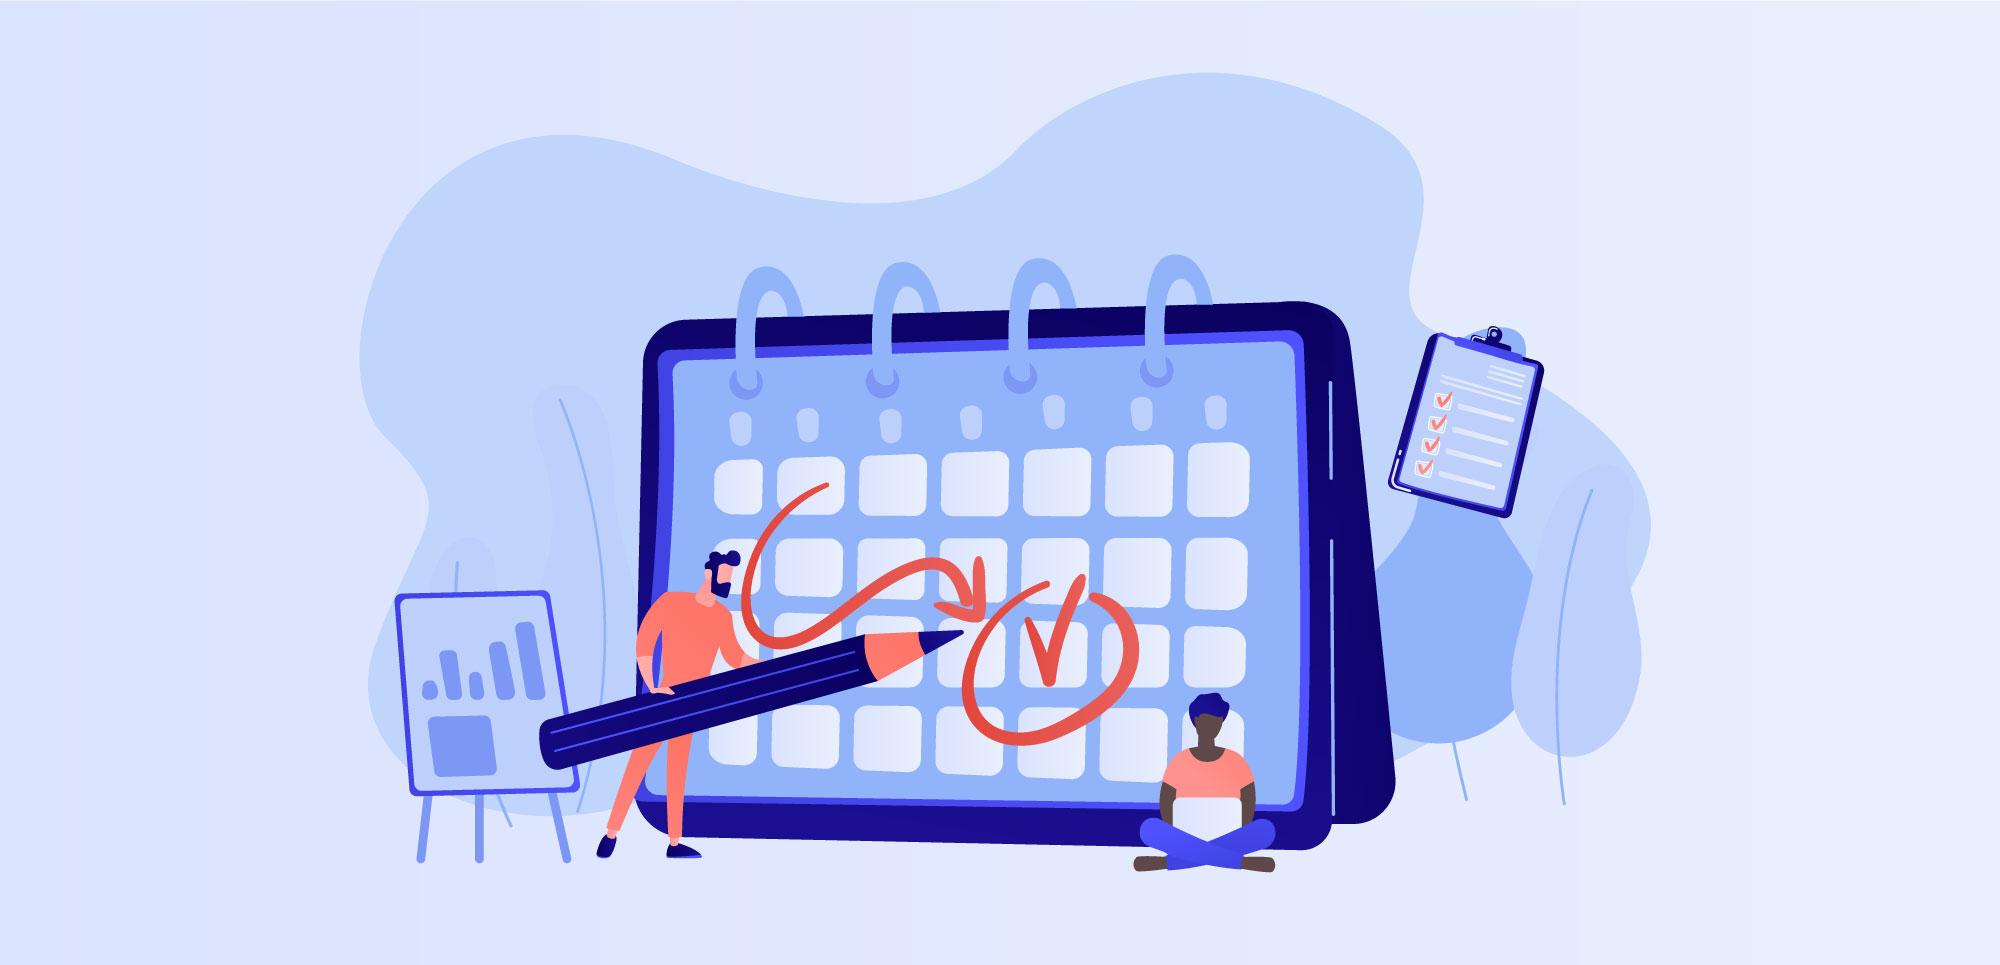 Illustration of tax deadline